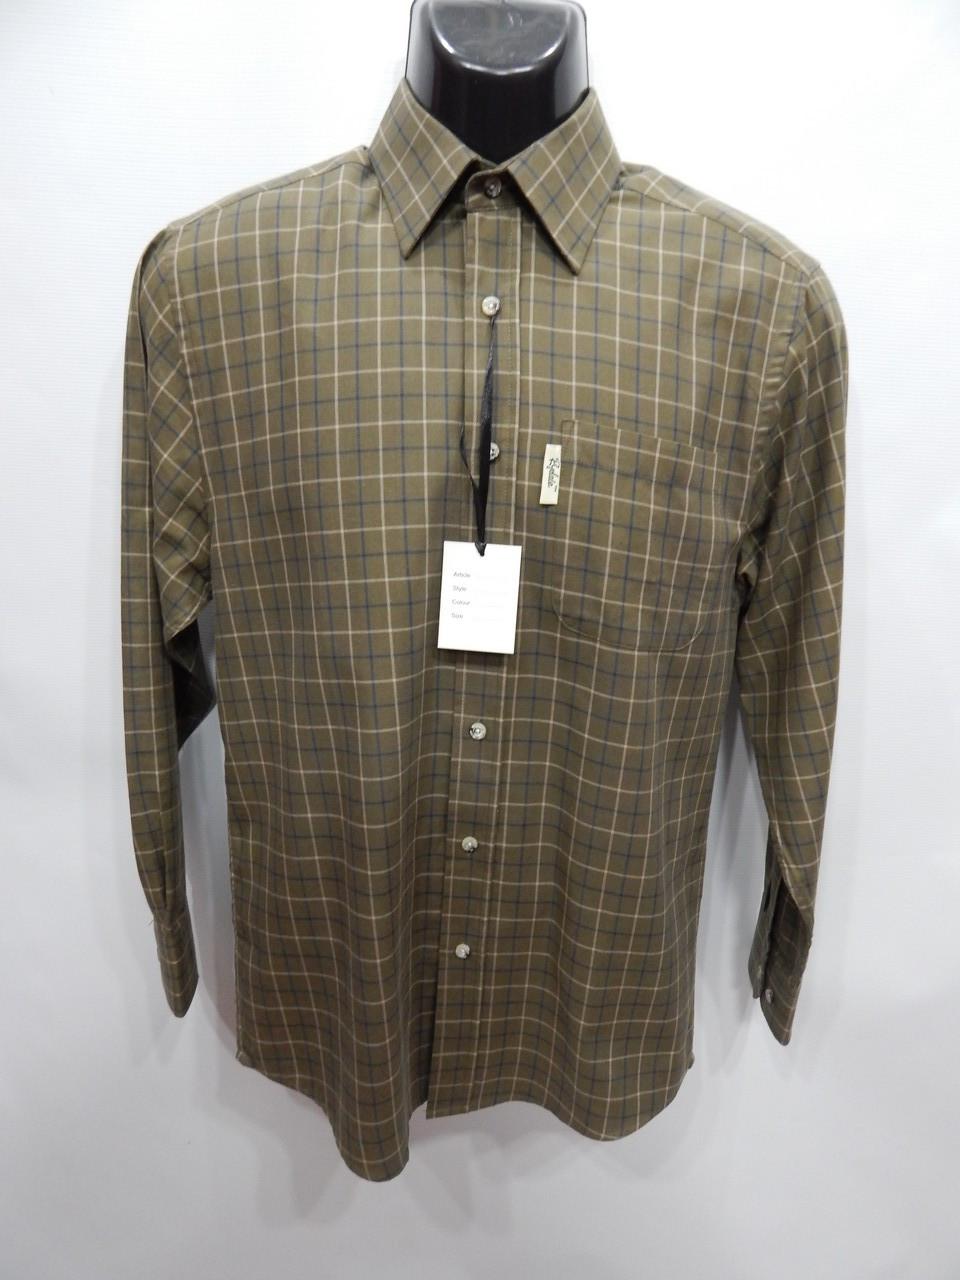 Чоловіча тепла сорочка з довгим рукавом Rydale р. 48 017RT